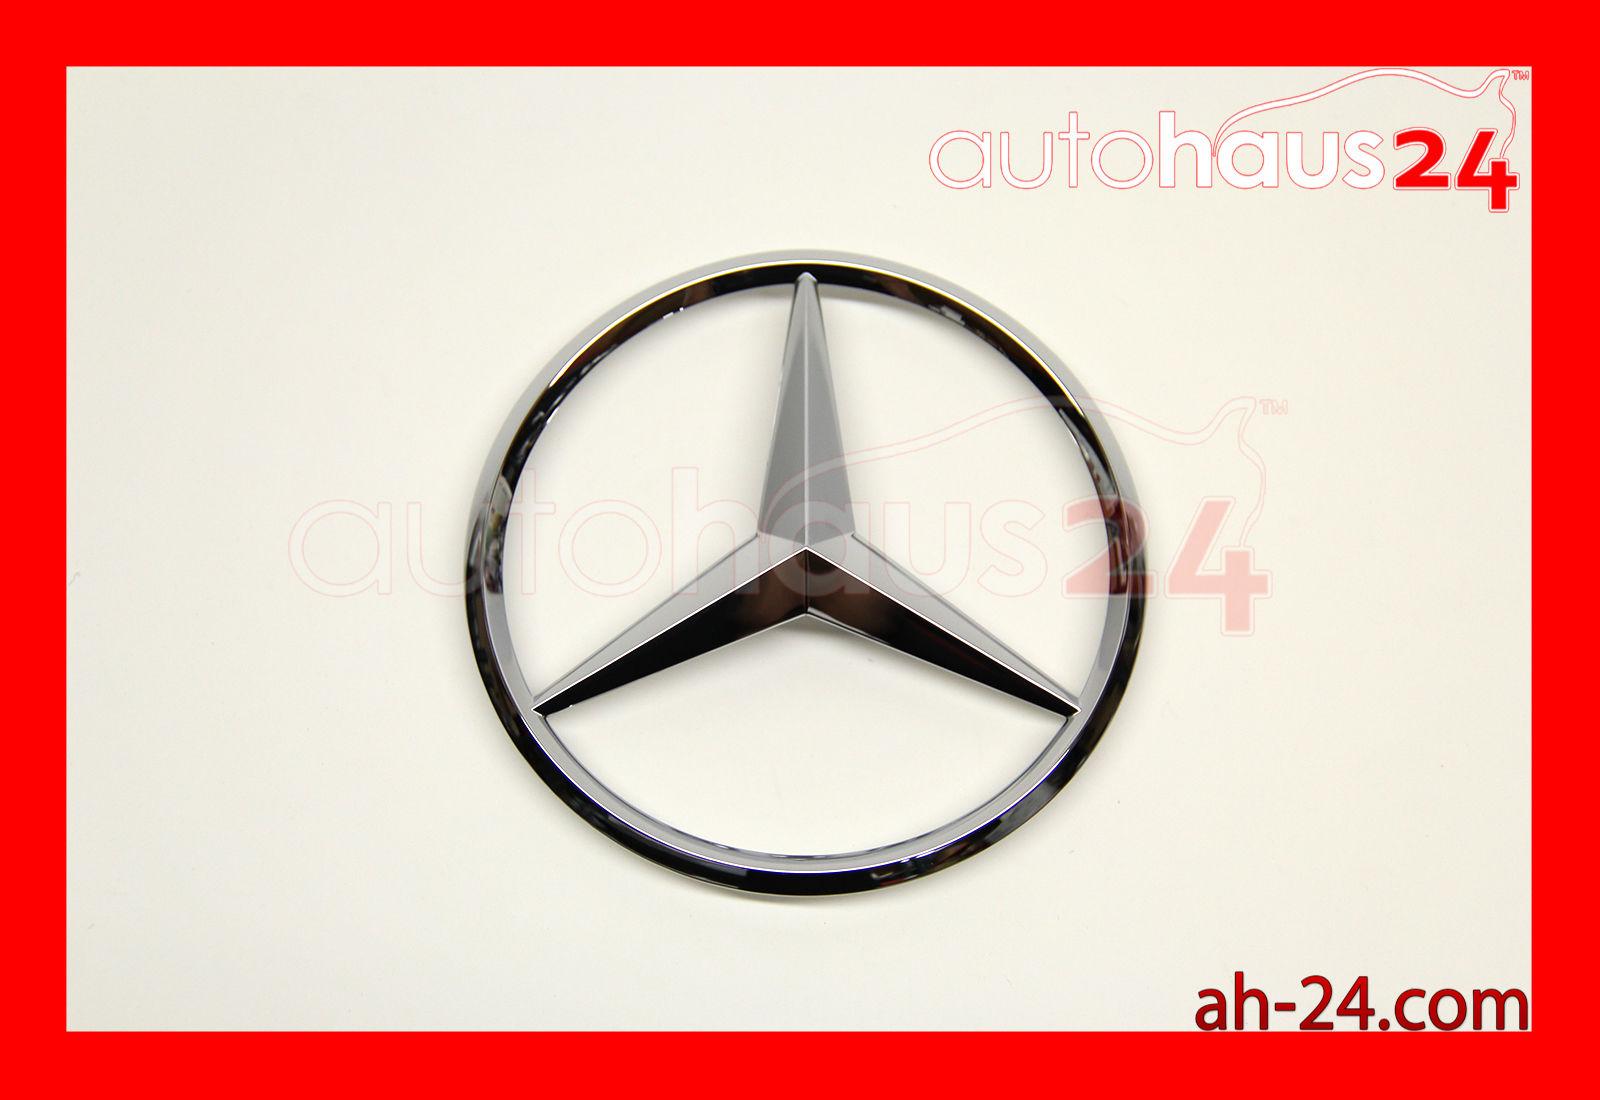 OEM MERCEDES 1298880286 300SL SL320 500SL 600SL GRILLE STAR 1996-2002 GENUINE